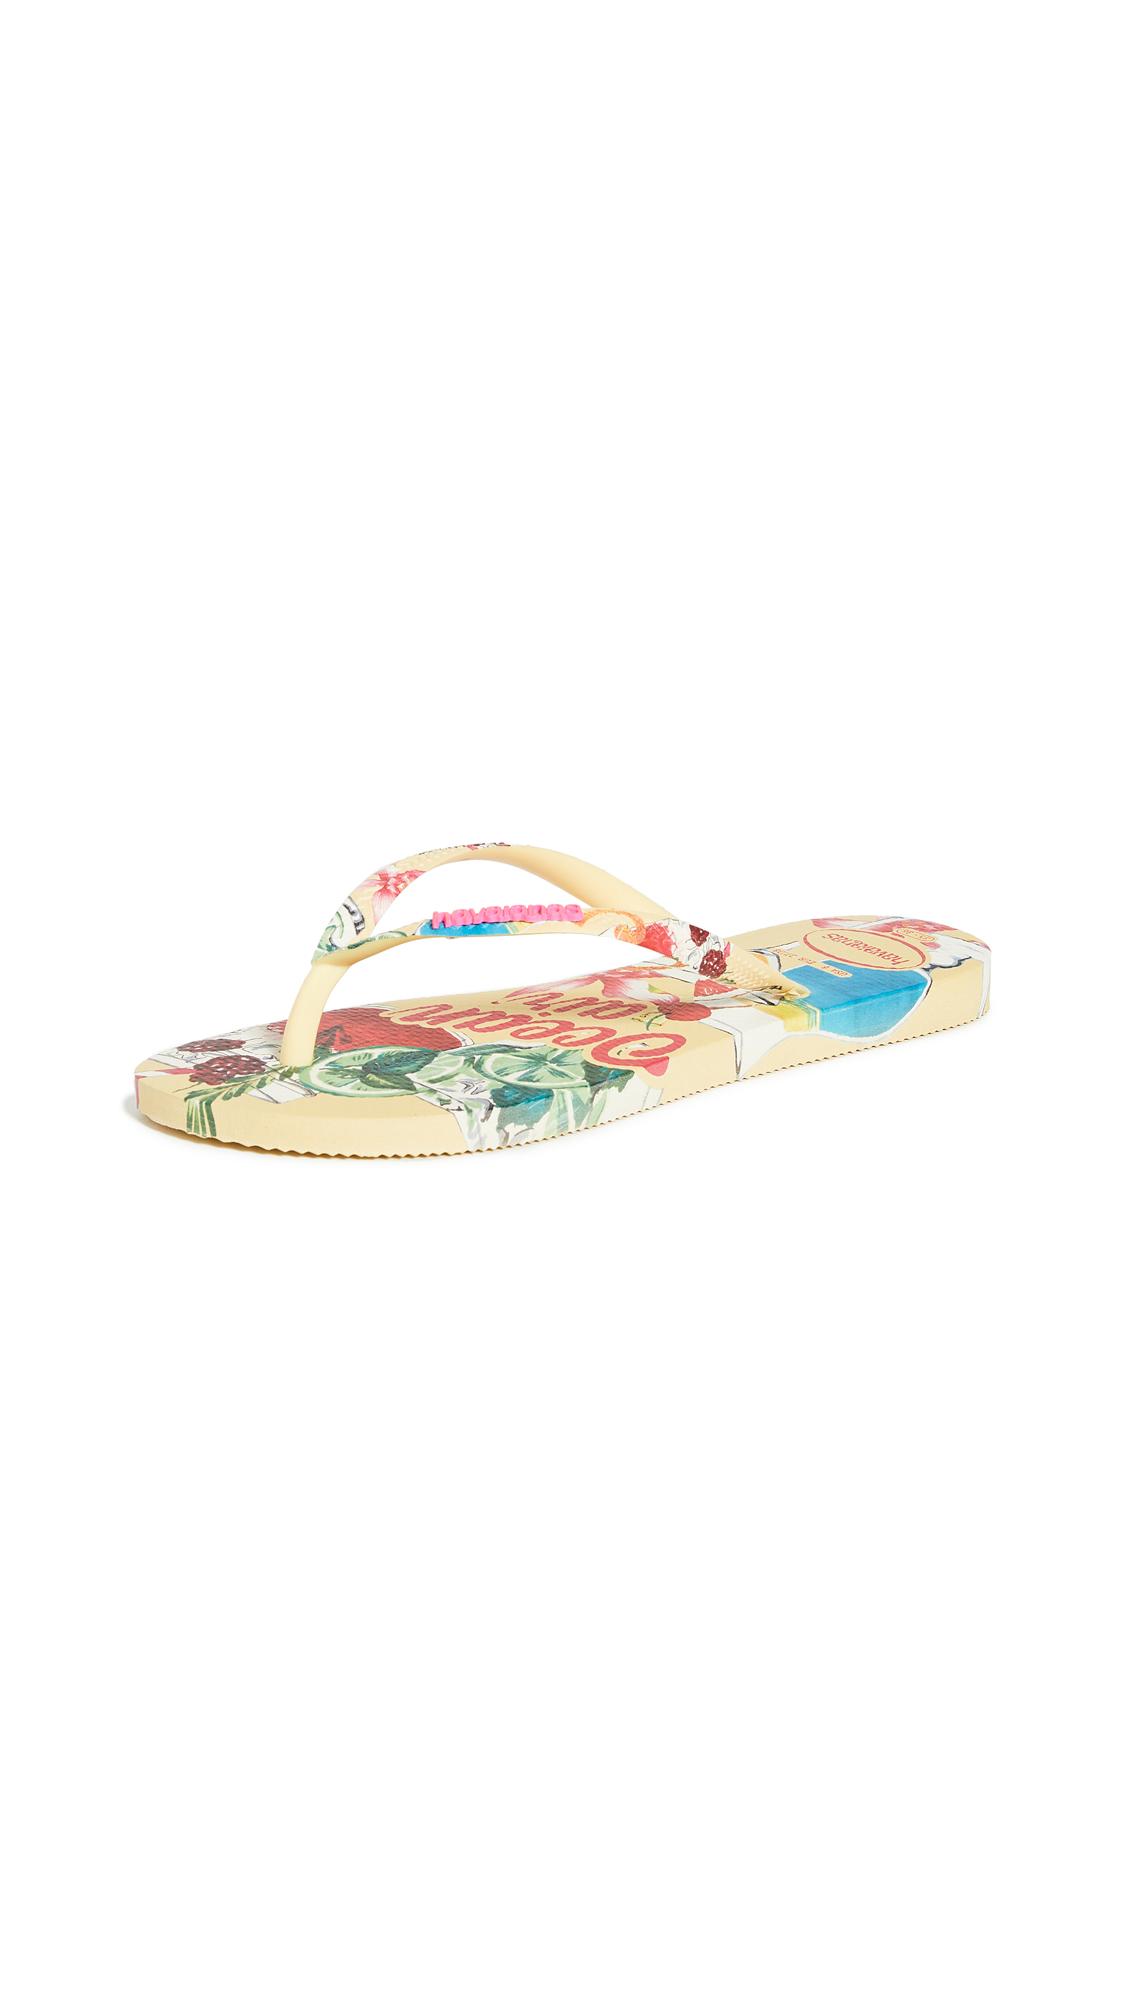 Buy Havaianas Slim Summer Flip Flops online, shop Havaianas